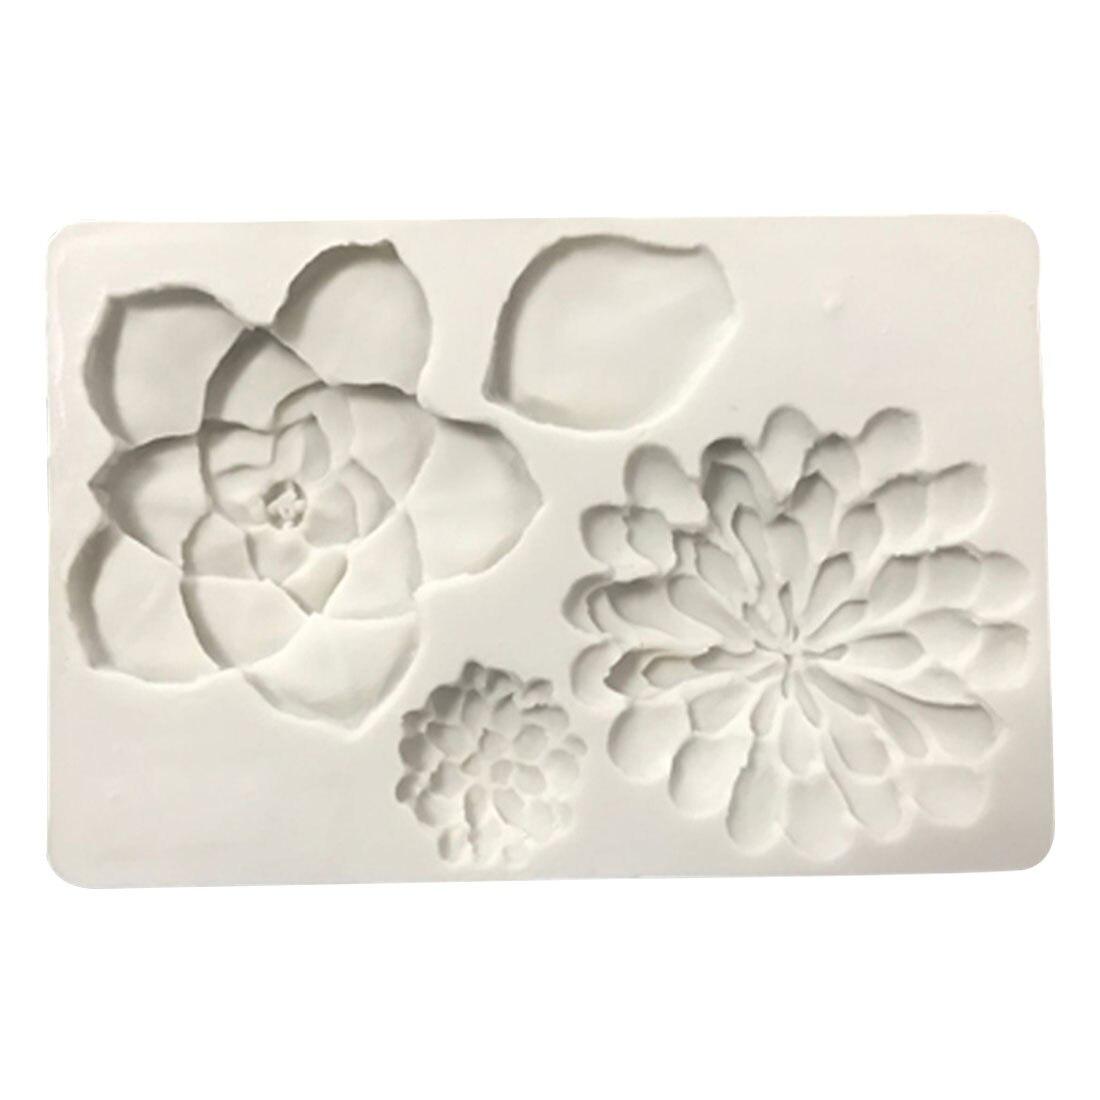 Hot Sale!Plant fleshy flowers silicone mould Fudge chocolate cake decorative mold silicone mold DIY handmade soap mold